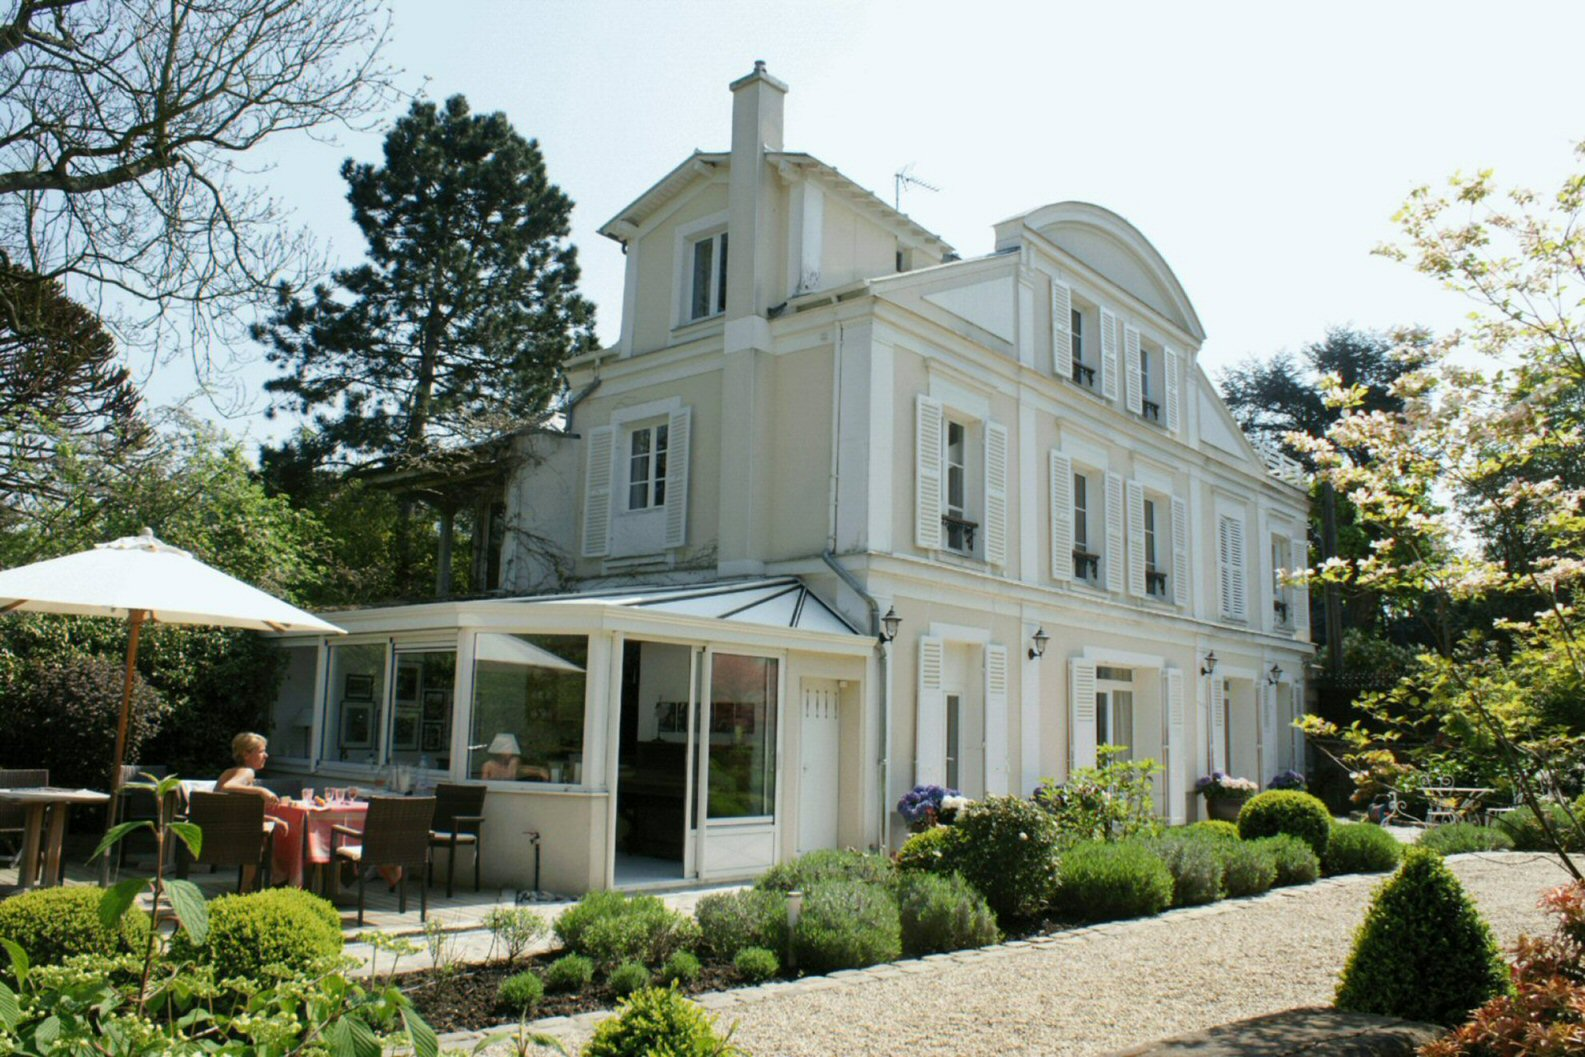 Villa Montmorency Paris France